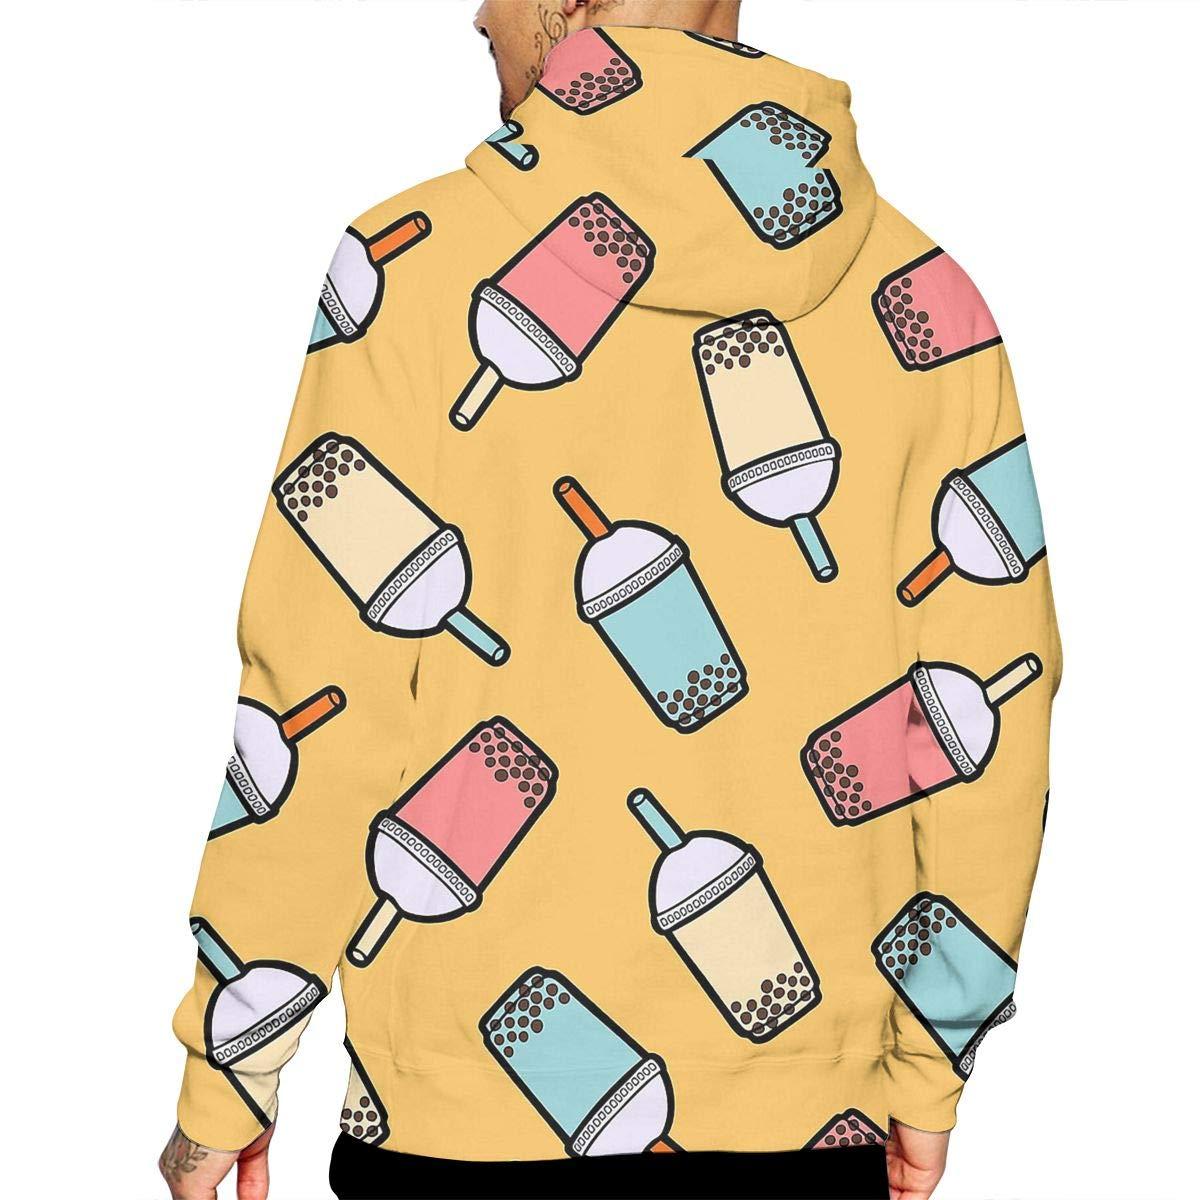 YUANSHAN Bubble Tea Cup Mans Long Sleeve Hoodie Casual Pocket Hooded Sweatshirt